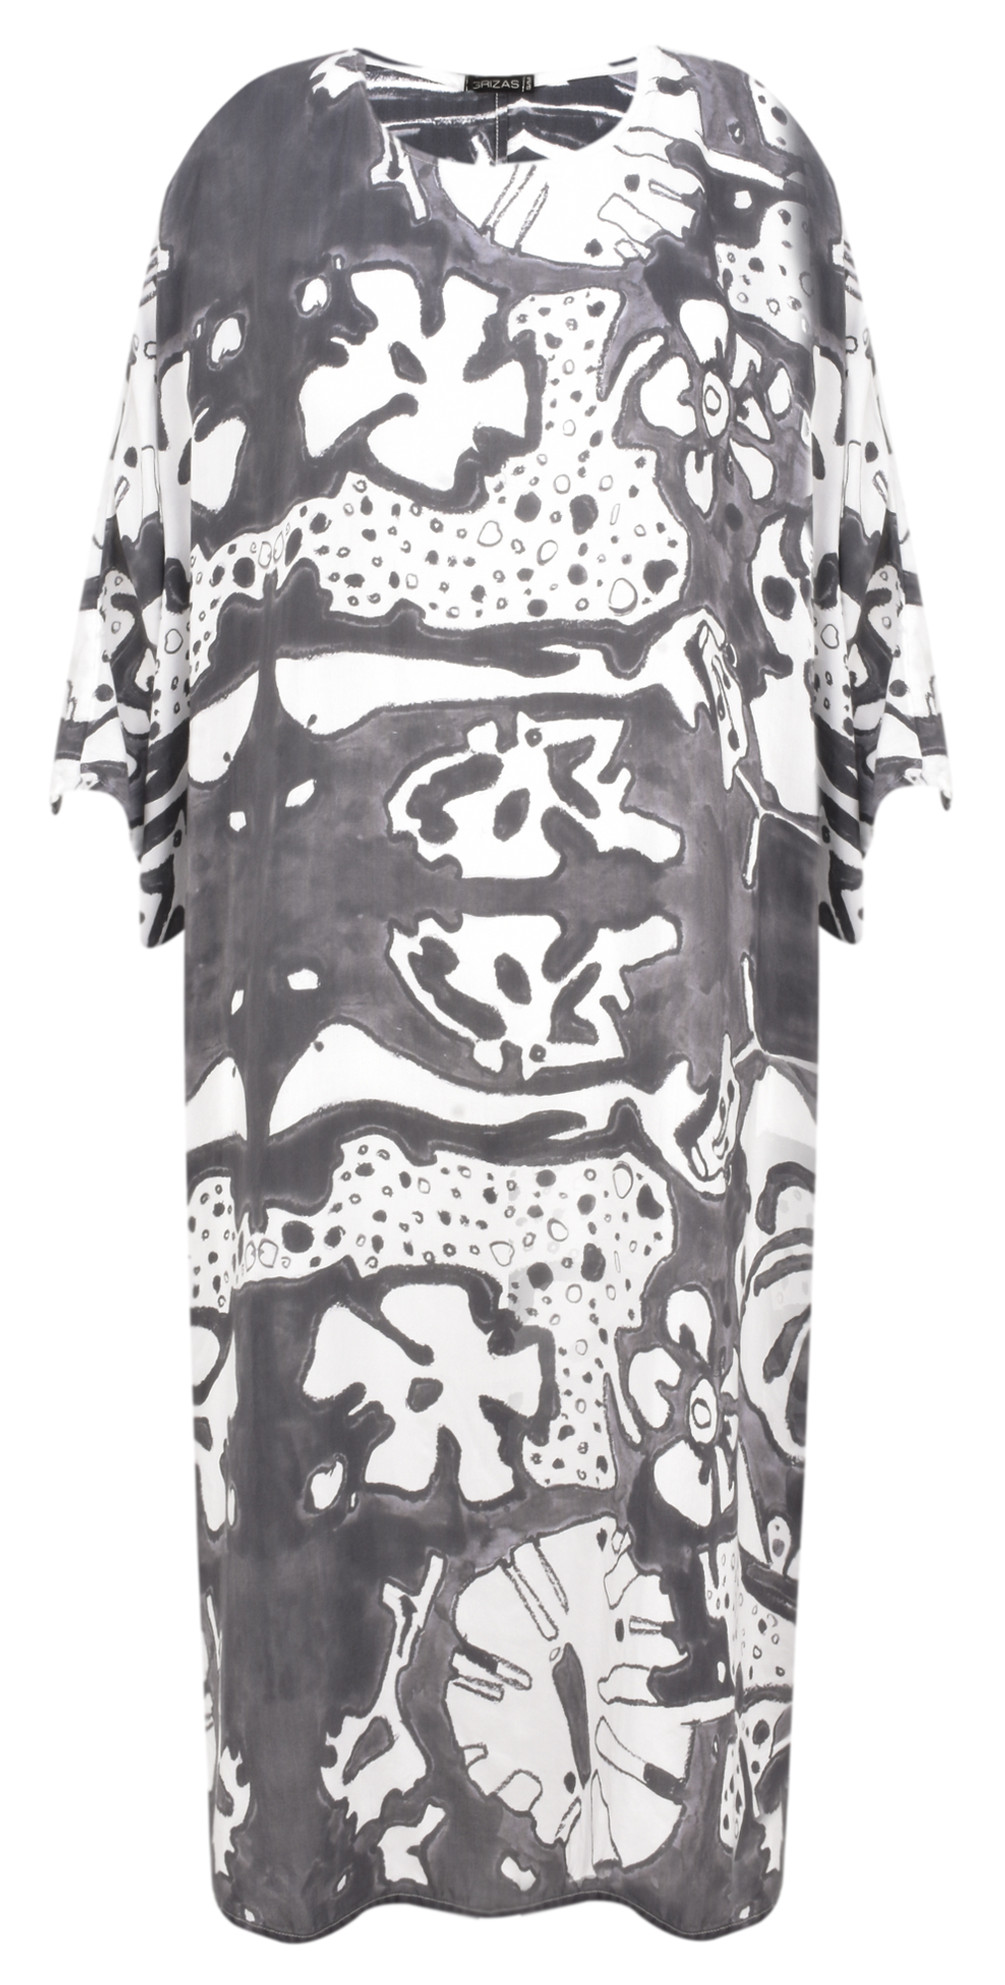 Vasara Printed Jersey Oversized Tunic main image